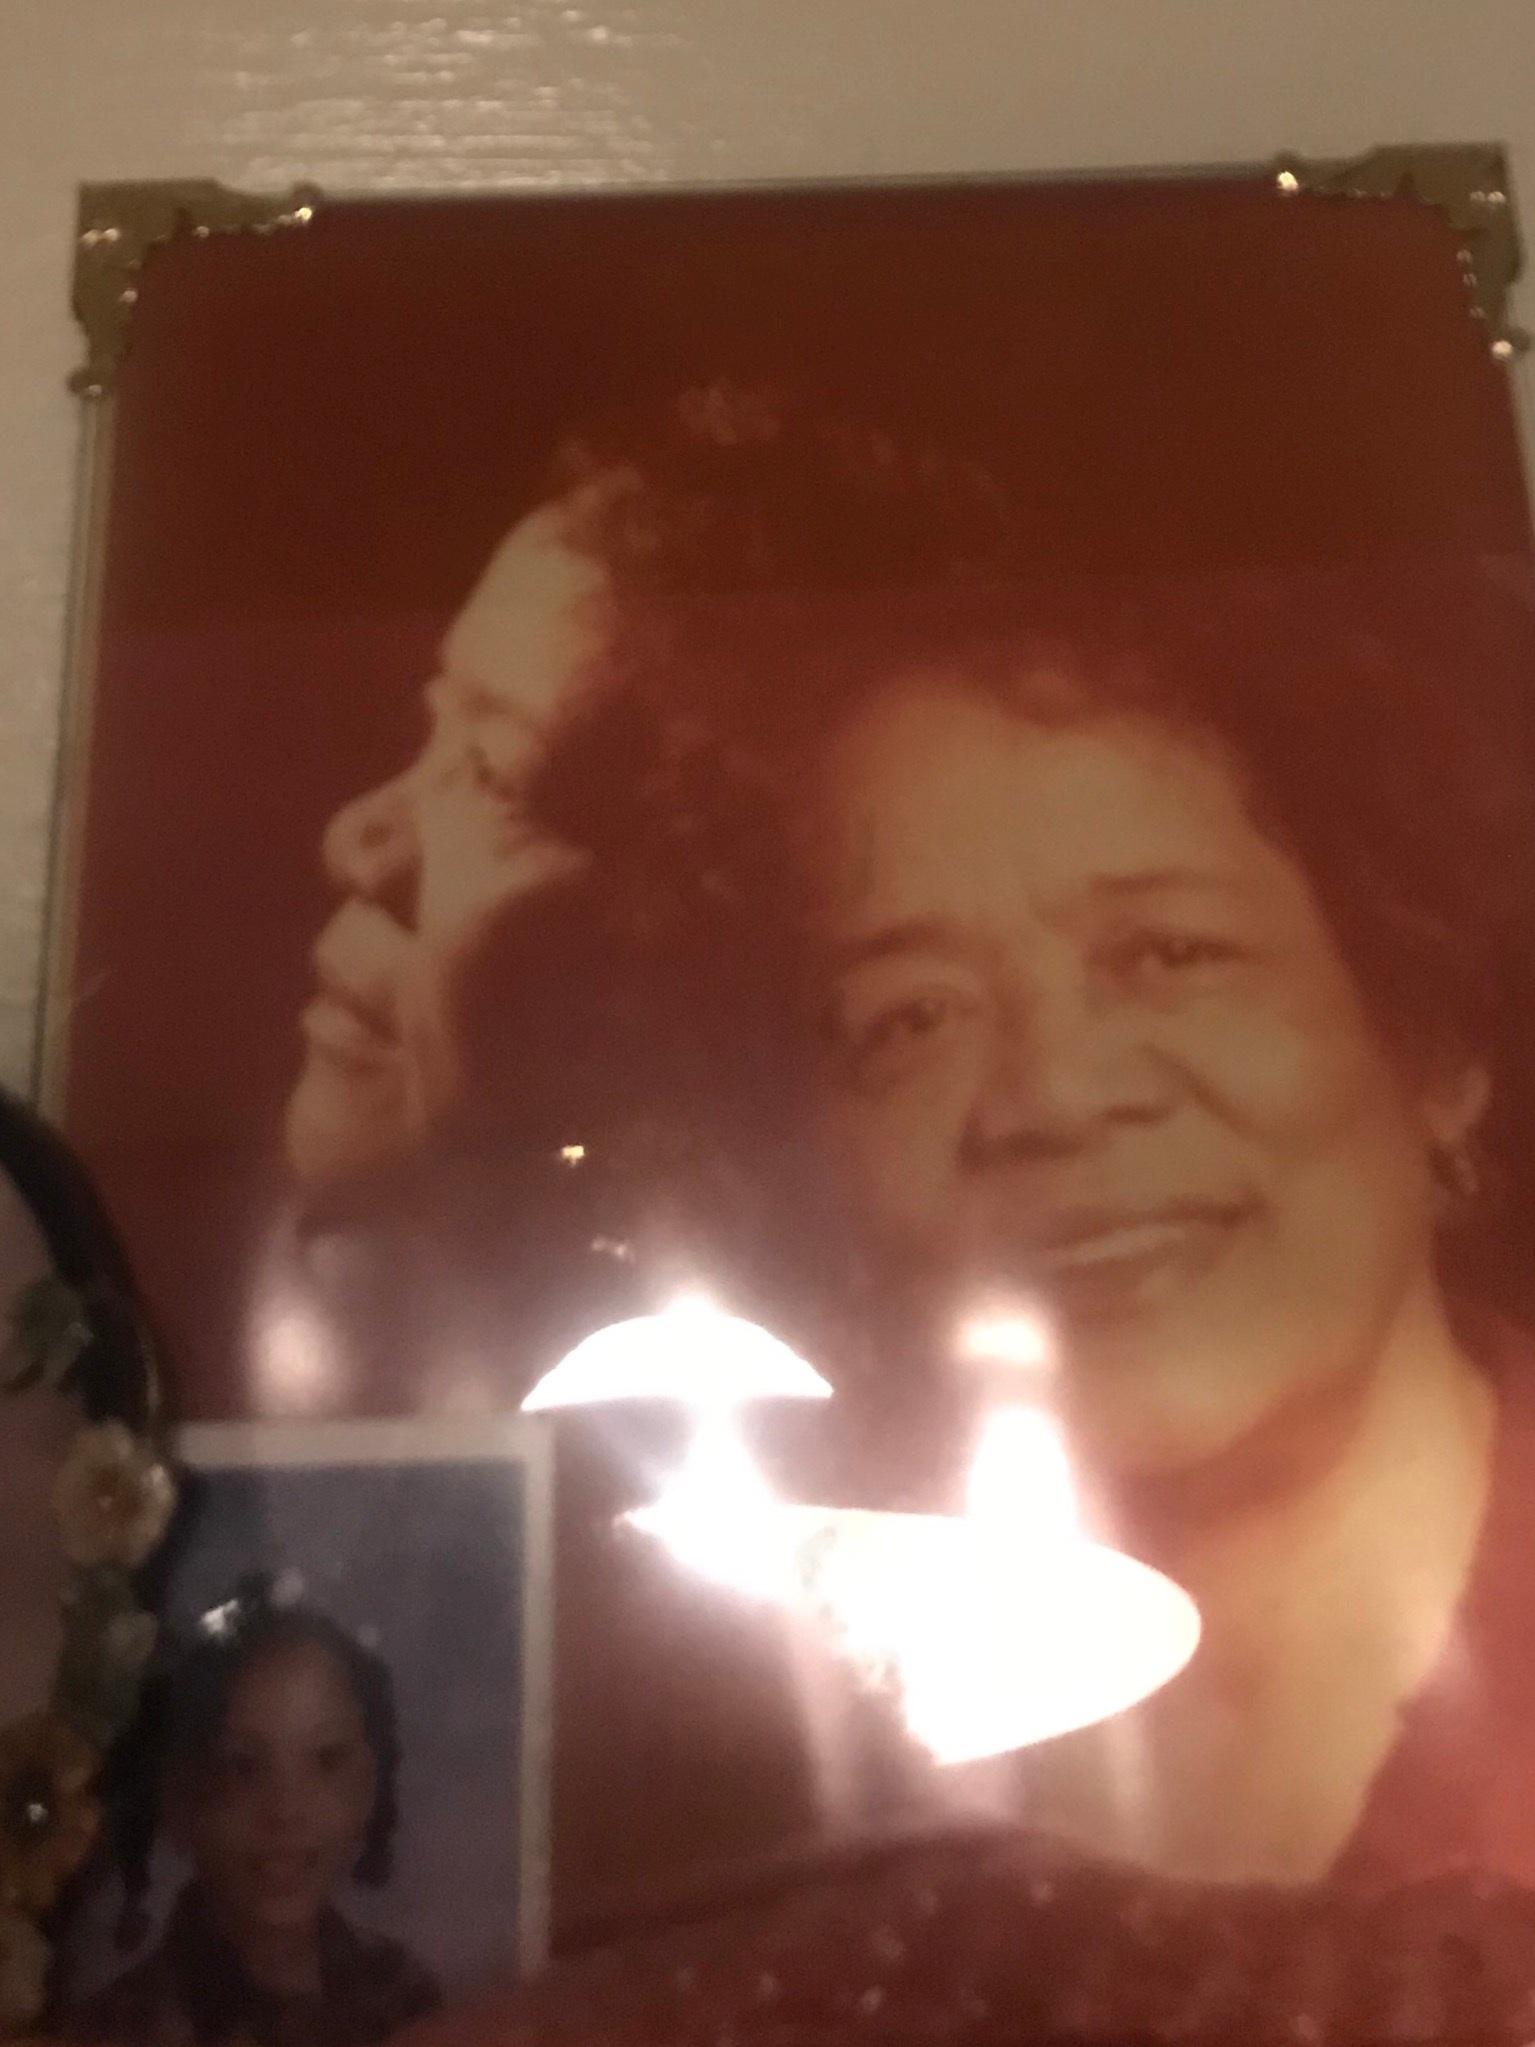 My beautiful great grandma. Rest in peace, Queen.